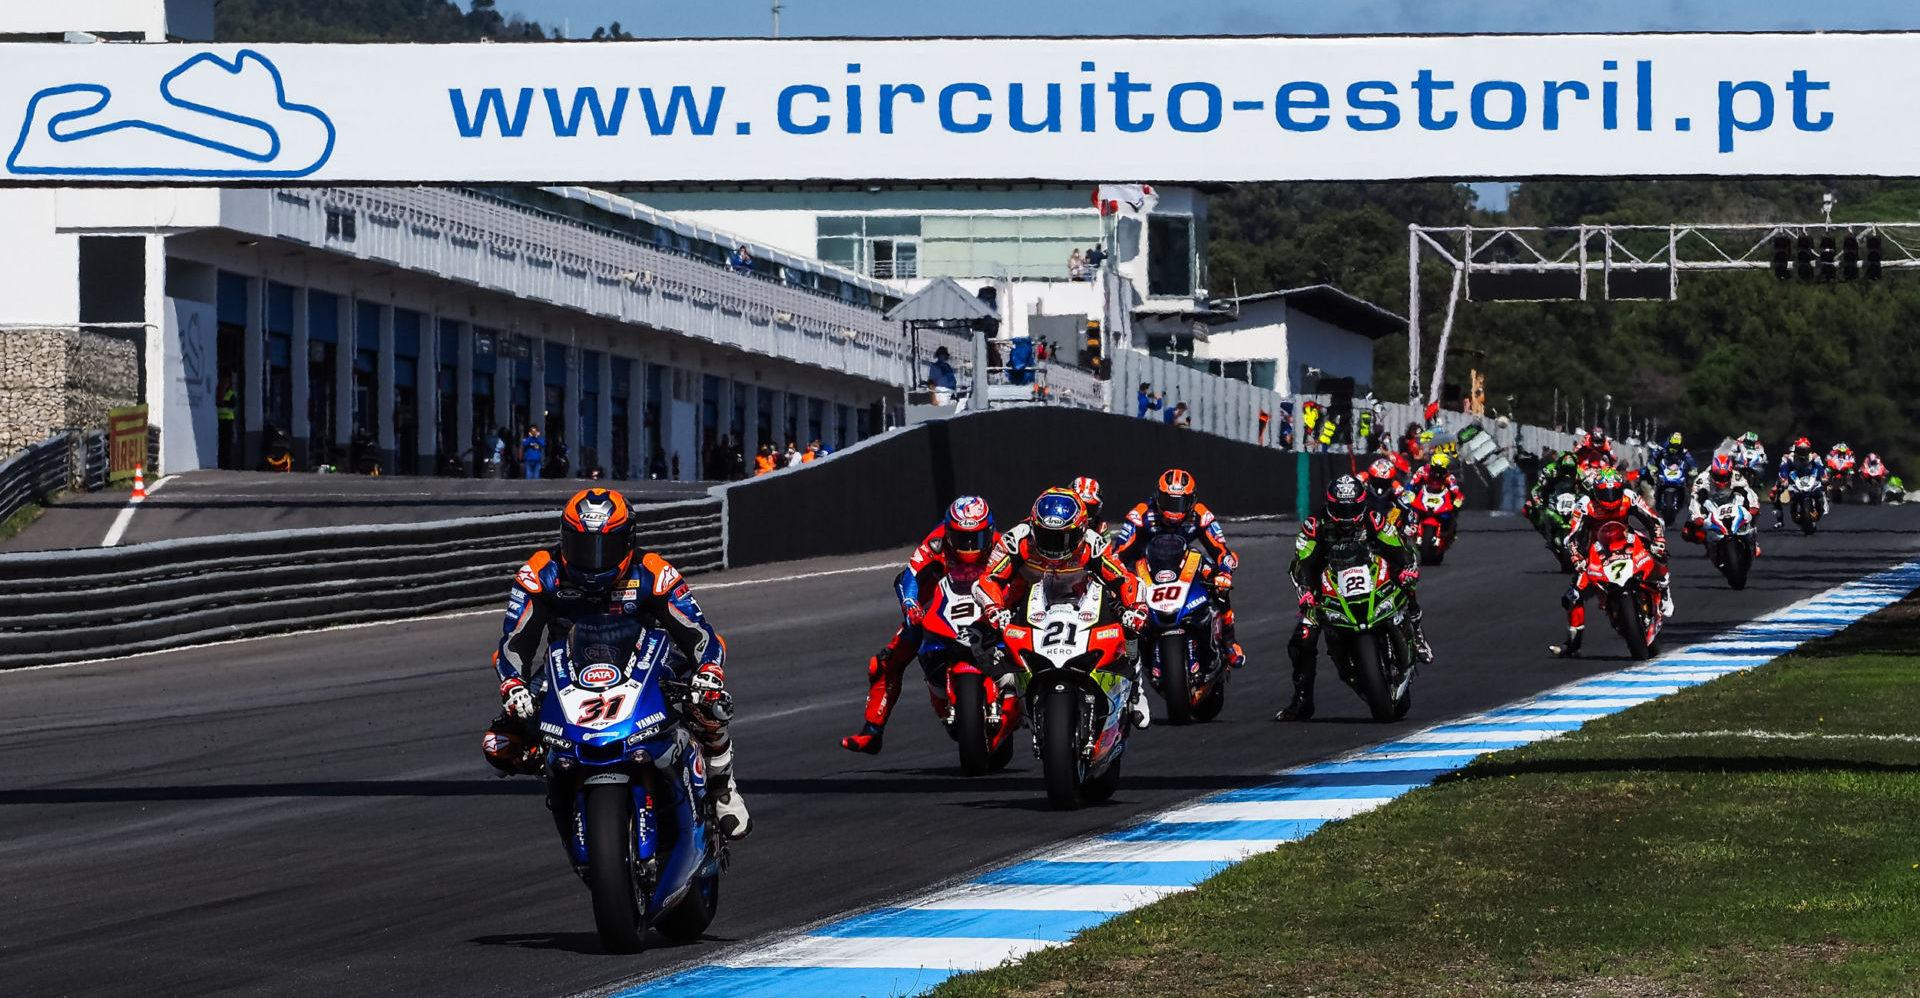 Garrett Gerloff (31) leading a group of riders into Turn One at Estoril. Photo courtesy Dorna.